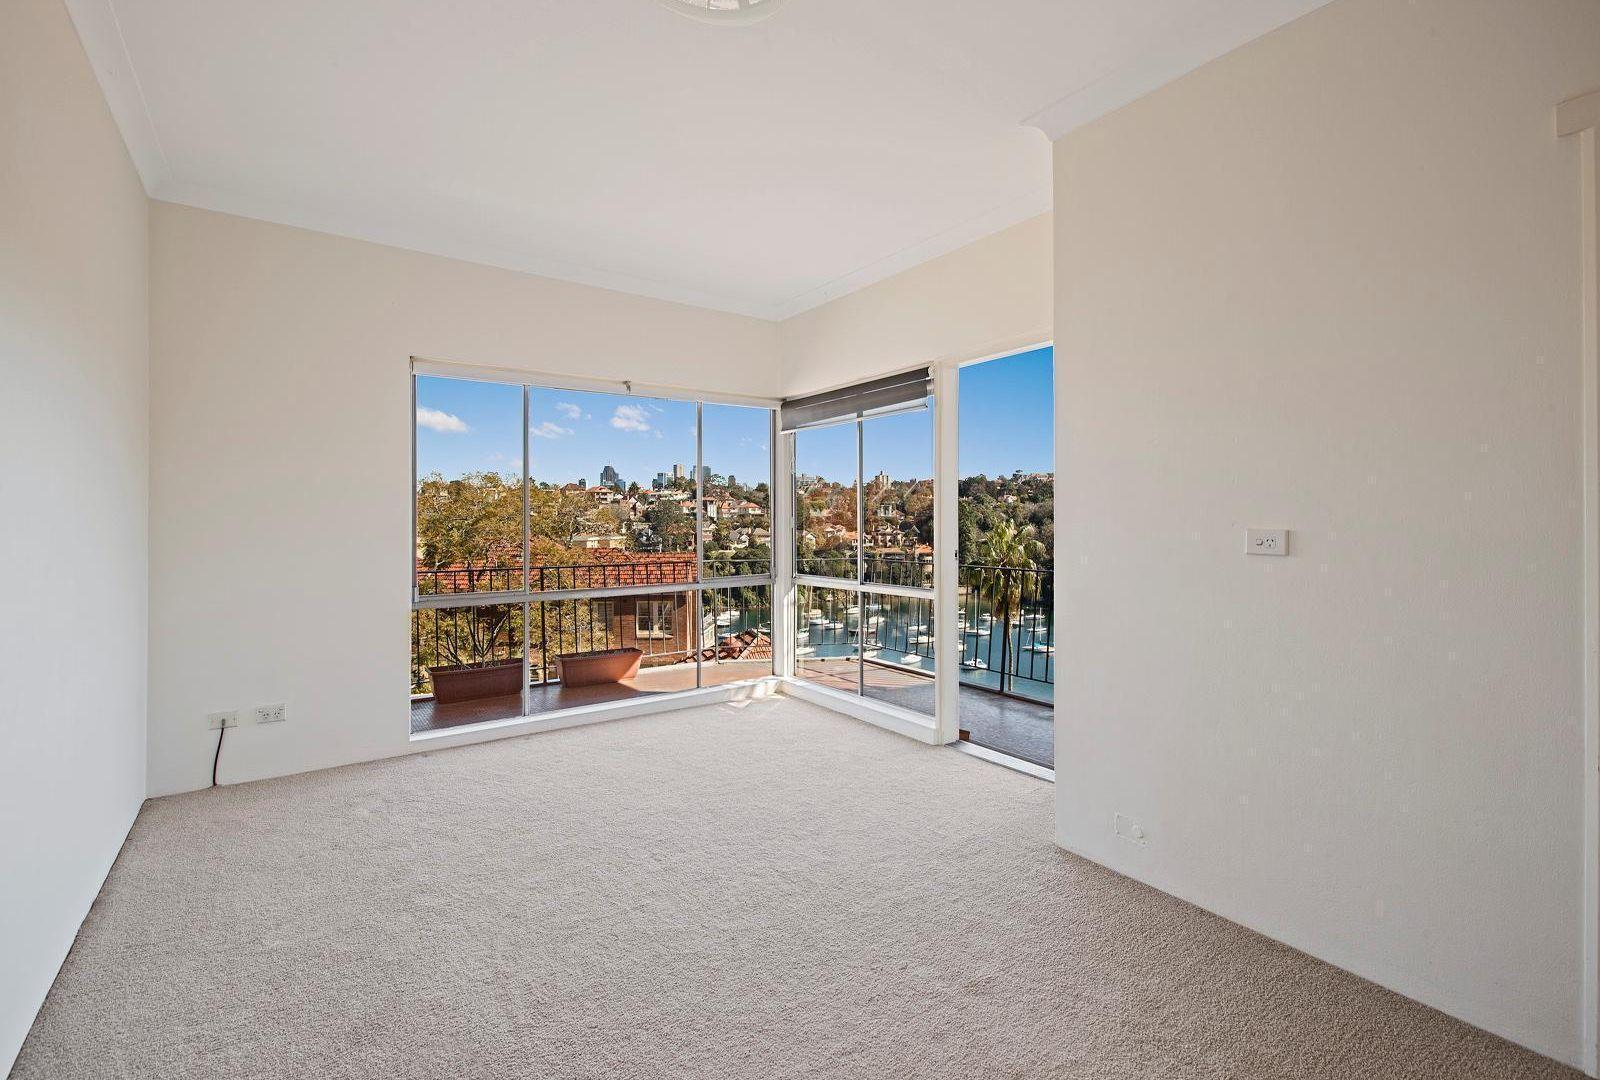 20/1 Mosman Street, Mosman NSW 2088, Image 1